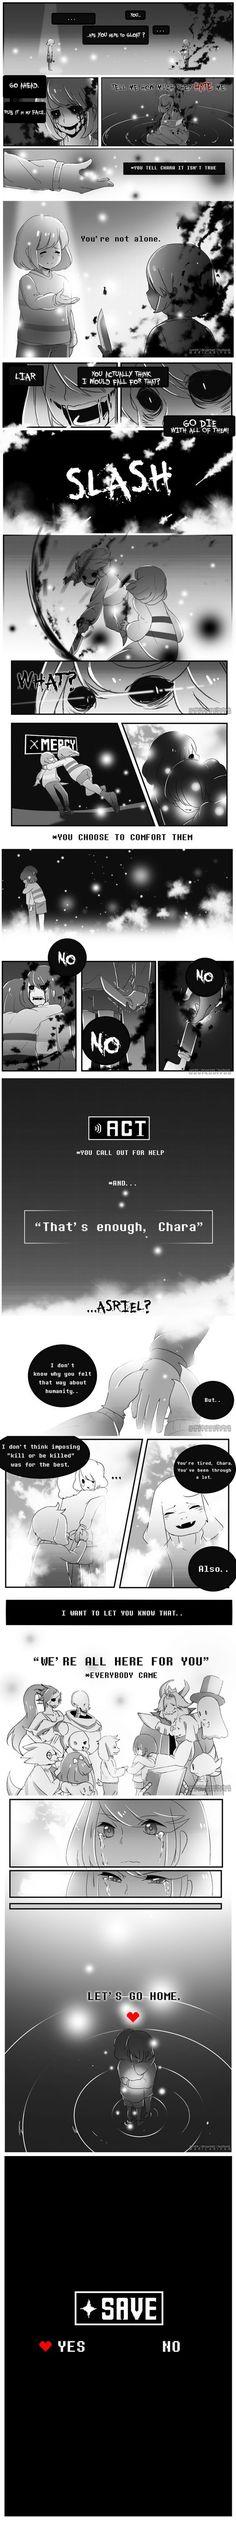 Undertale Comic : SAVE CHARA by maricaripan.deviantart.com on @DeviantArt: